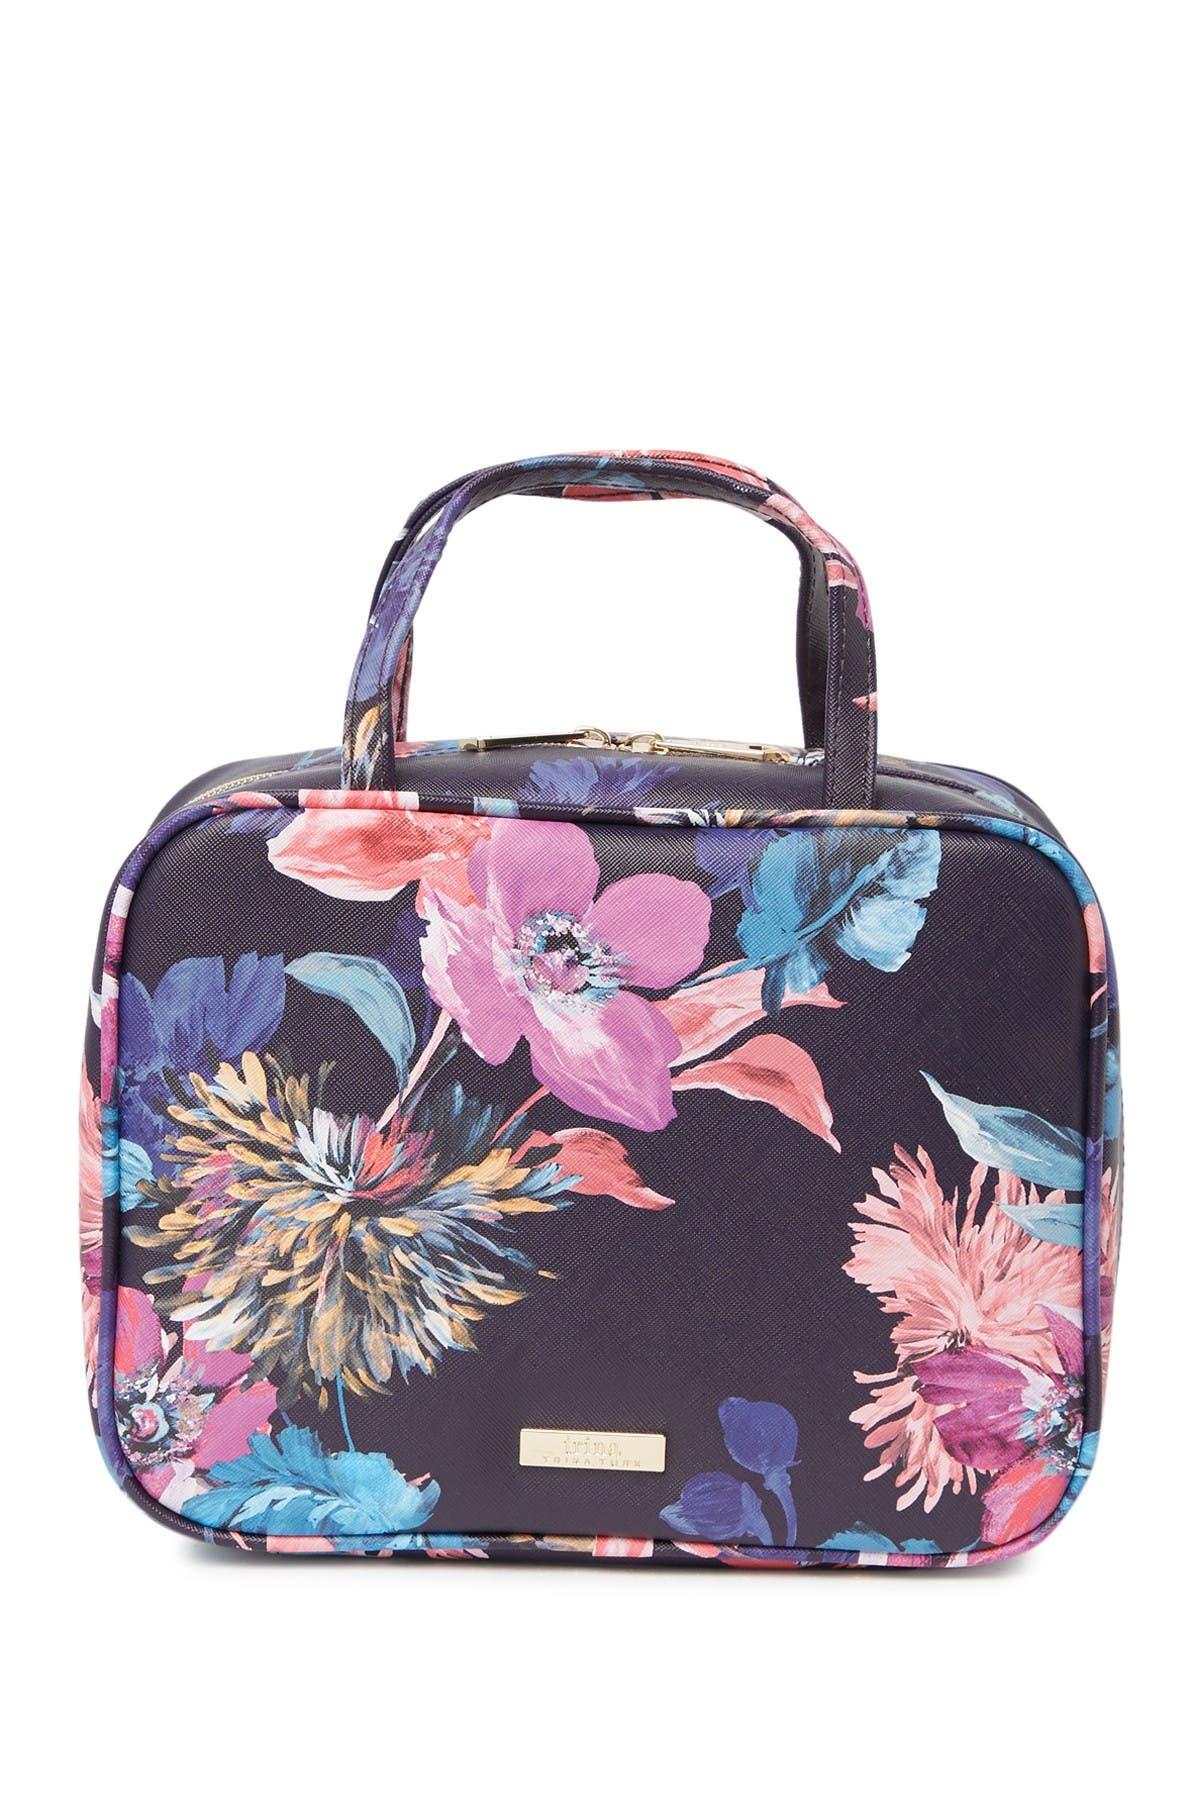 Image of Trina Turk Floral Print Travel Case